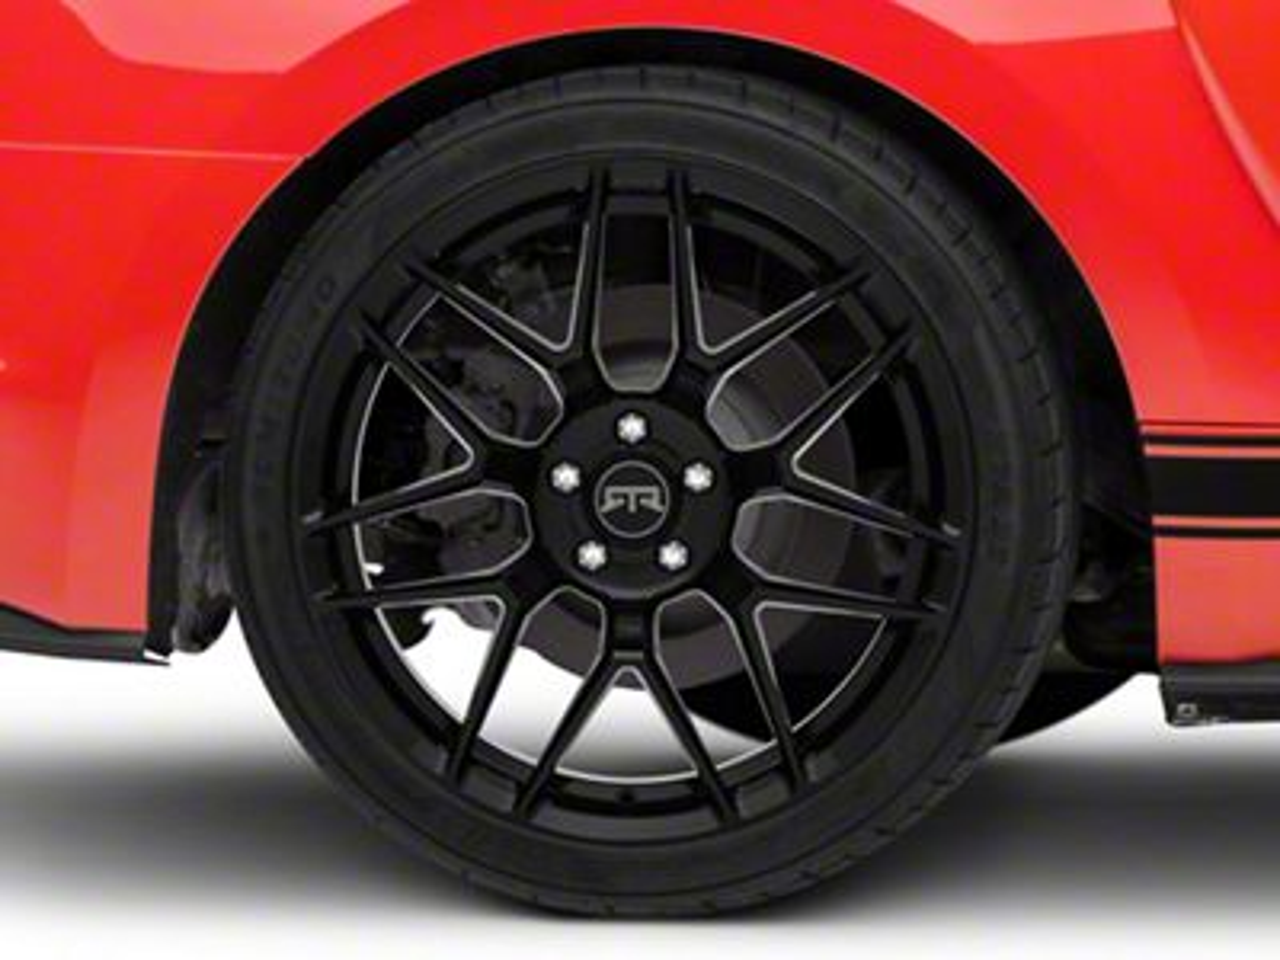 Add RTR Tech 7 Black Wheel - 20x10.5